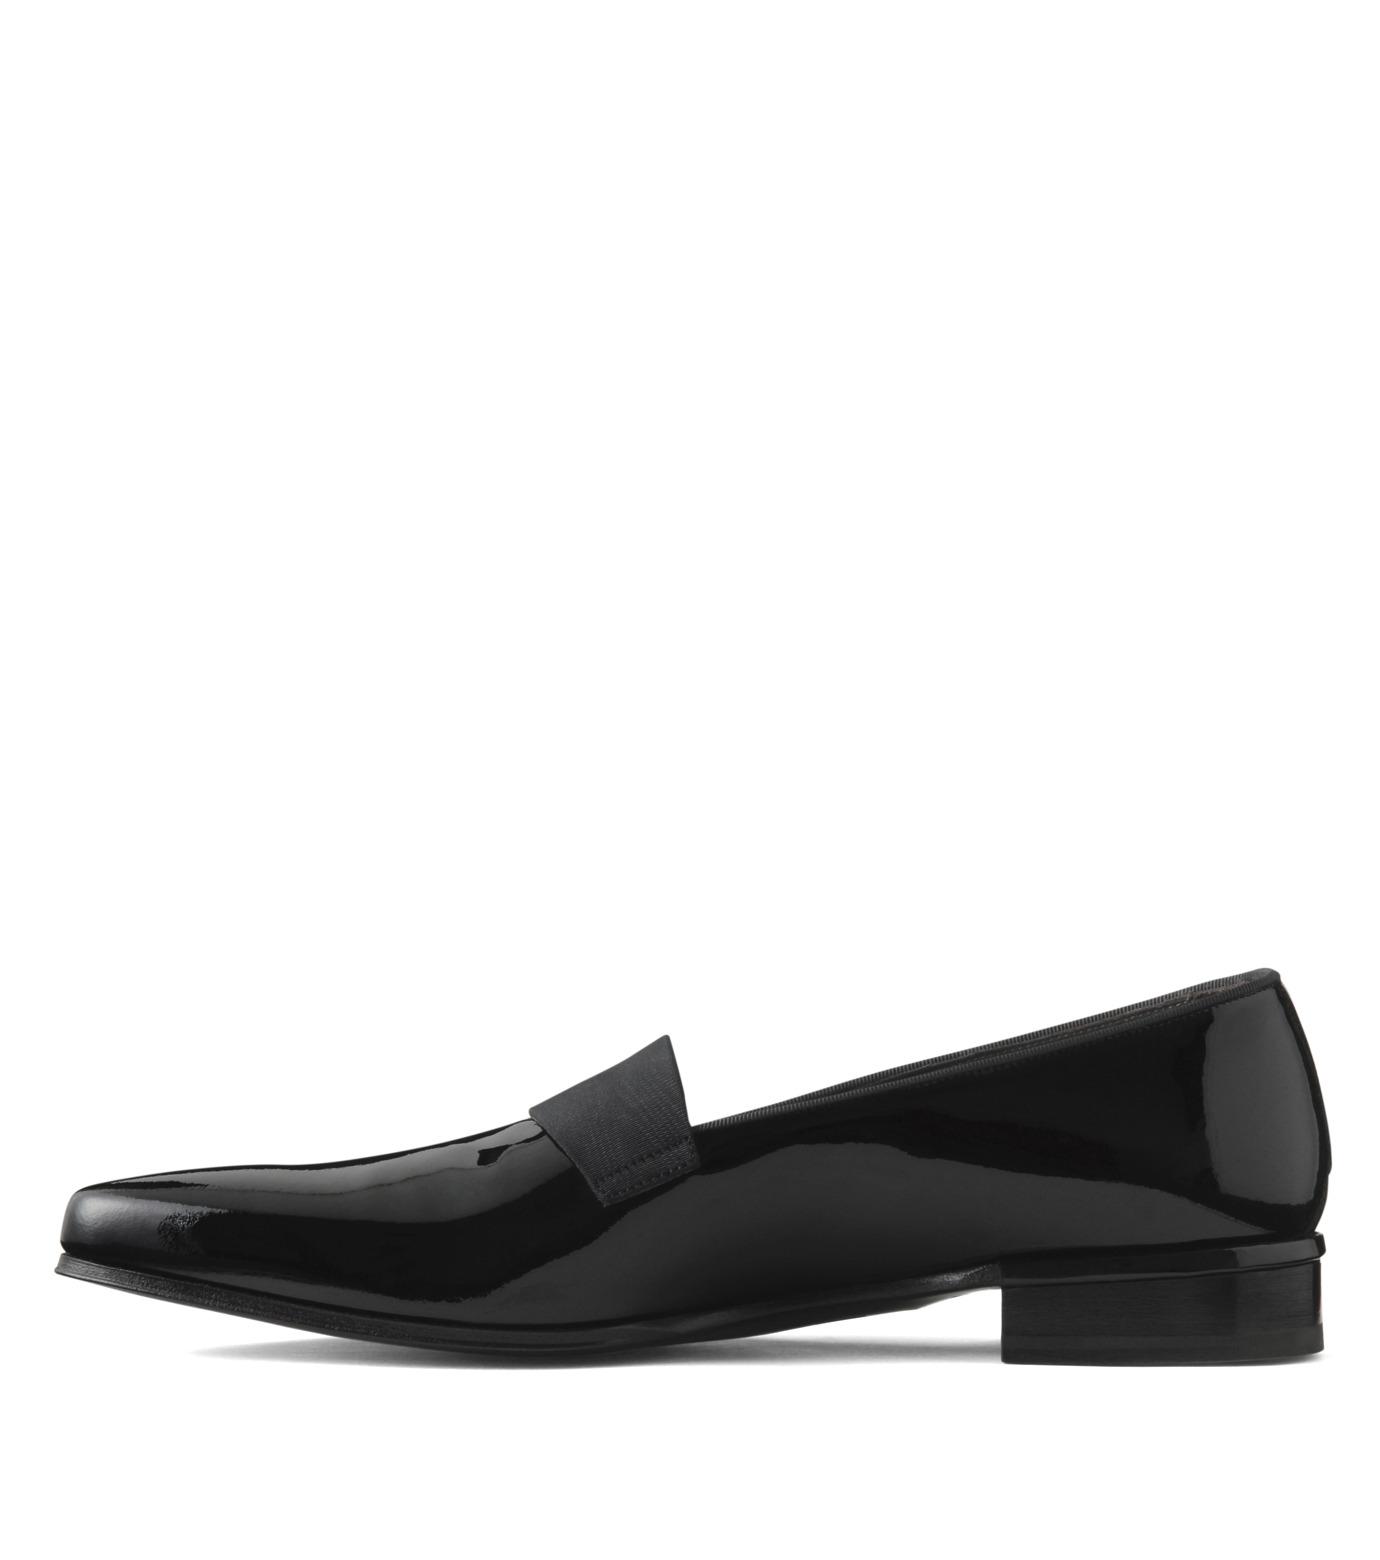 Max Verre(マックス ヴェッレ)のPatent Slip on-BLACK(シューズ/shoes)-MV910-CHESTE-13 拡大詳細画像2